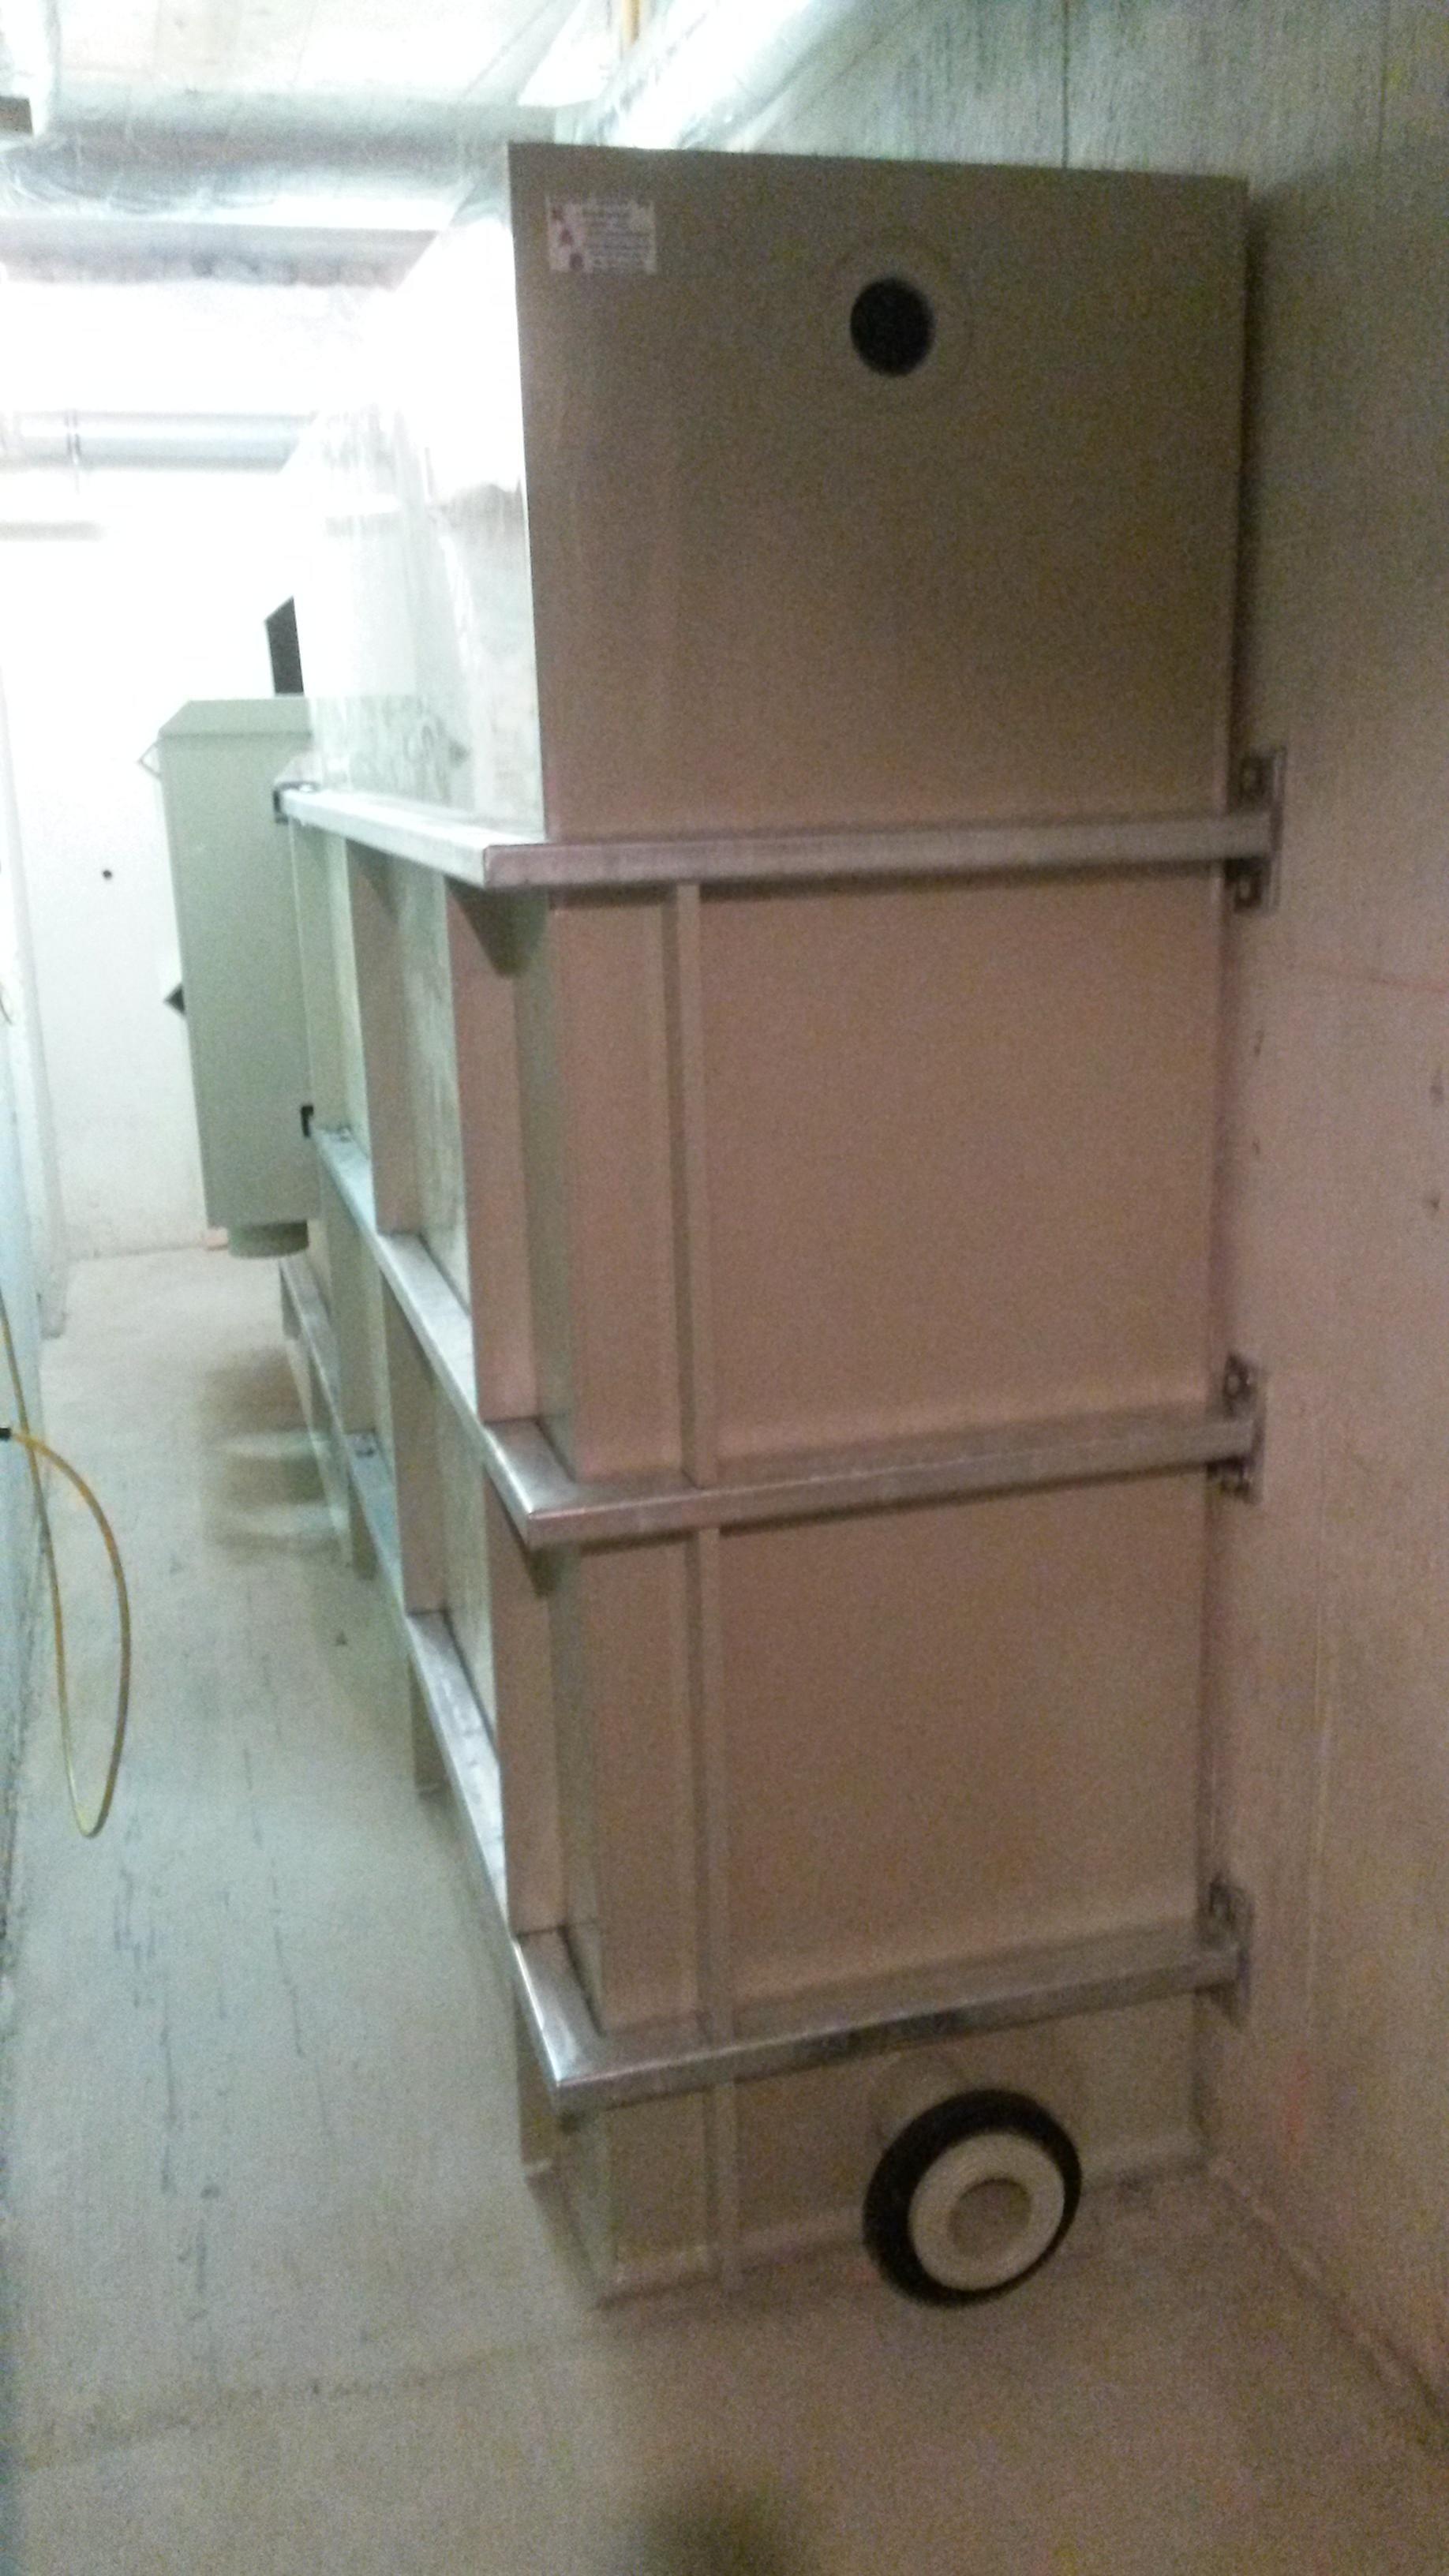 kunststoff apparate bau n rnberg gmbh r thenbach pegnitz 90552 yellowmap. Black Bedroom Furniture Sets. Home Design Ideas